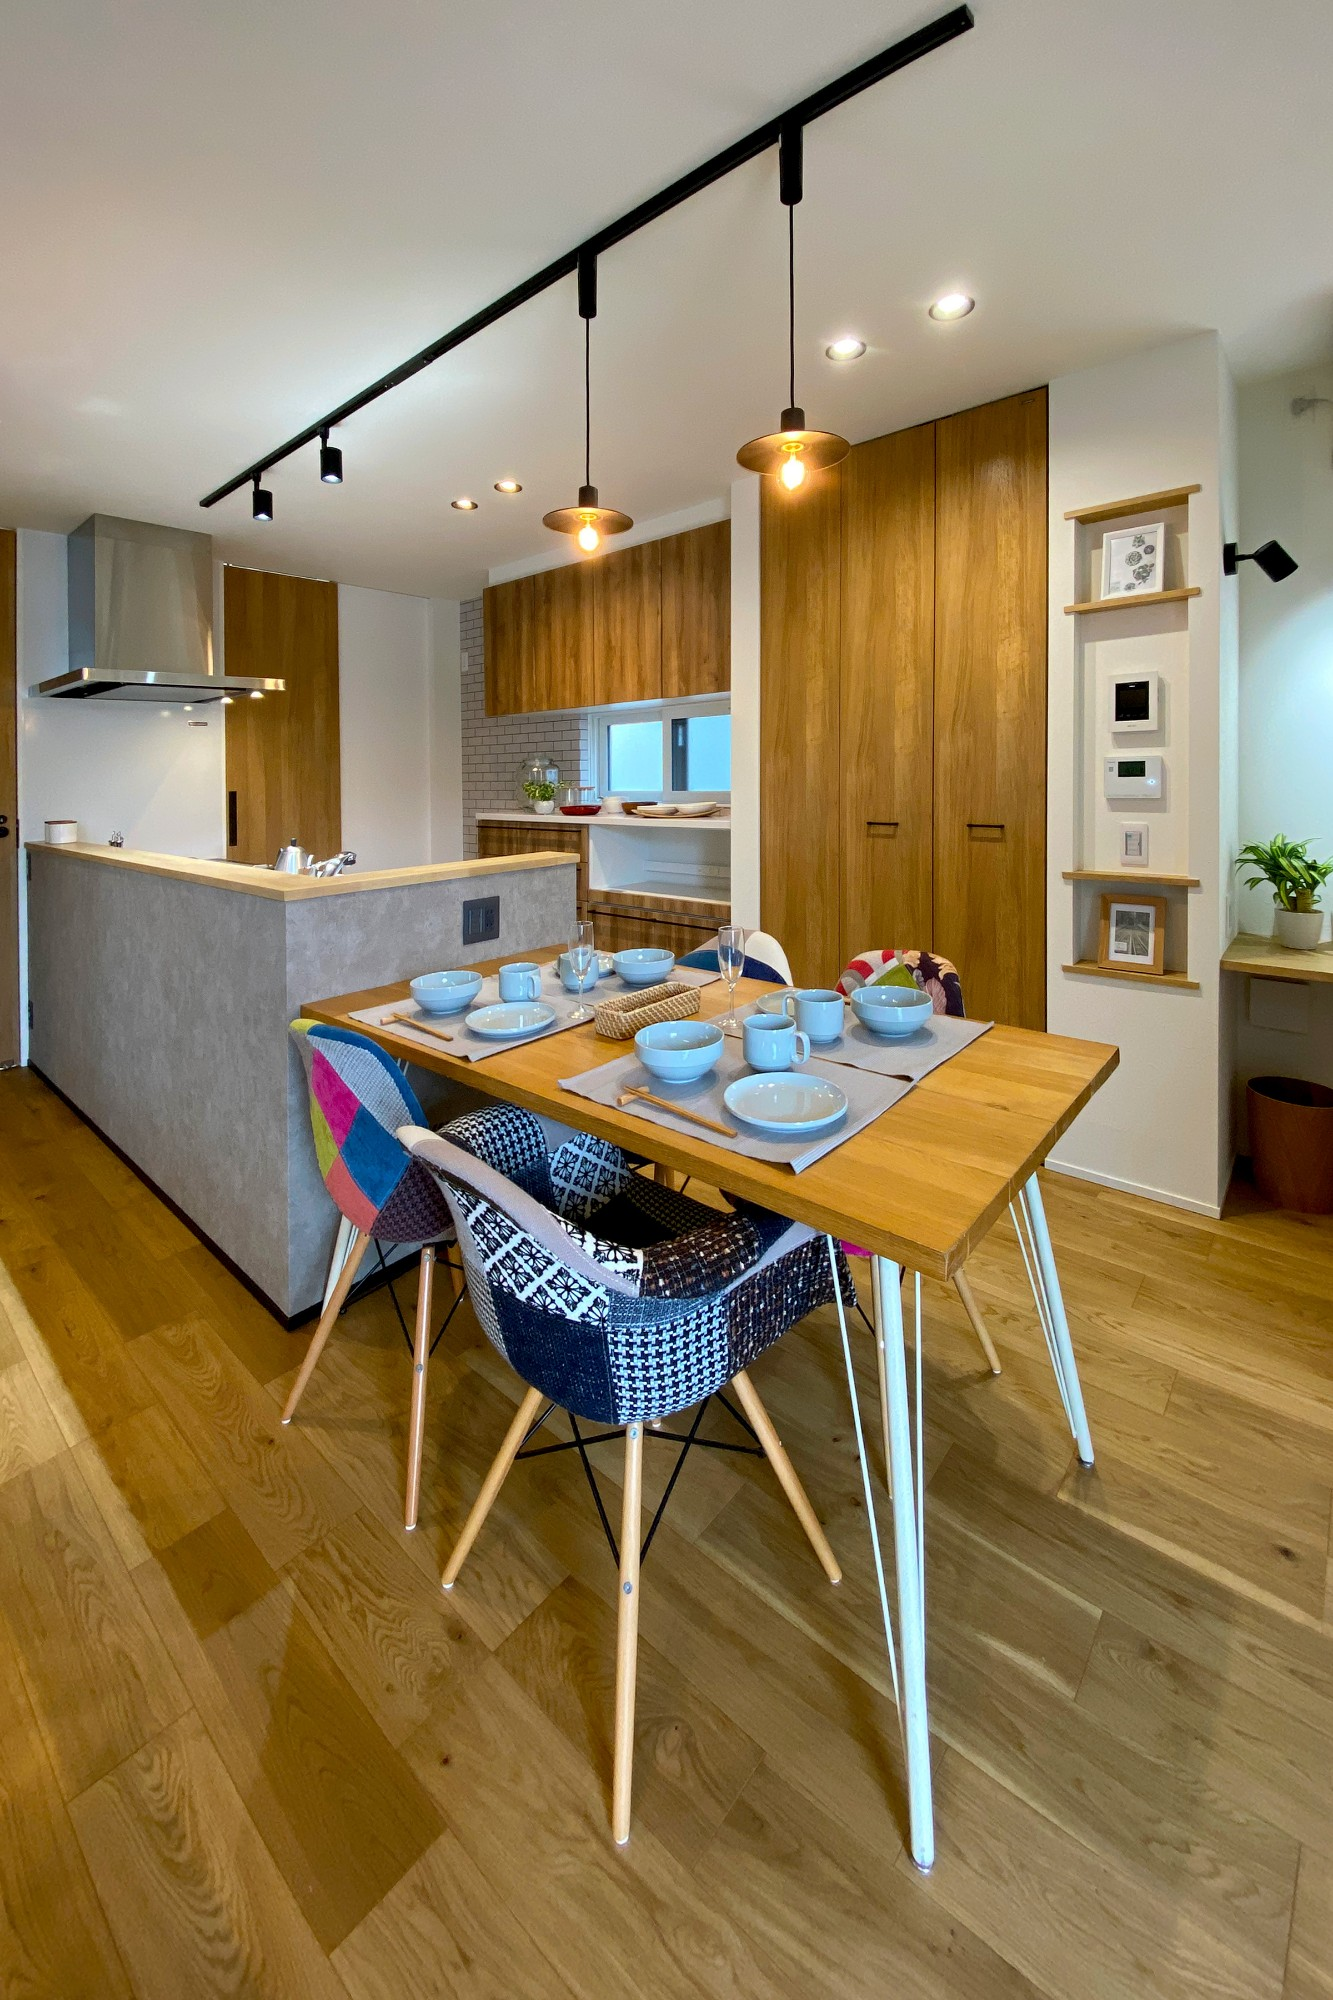 DETAIL HOME(ディテールホーム)「オークを基調としたナチュラルモダンな家」のシンプル・ナチュラルなキッチンの実例写真